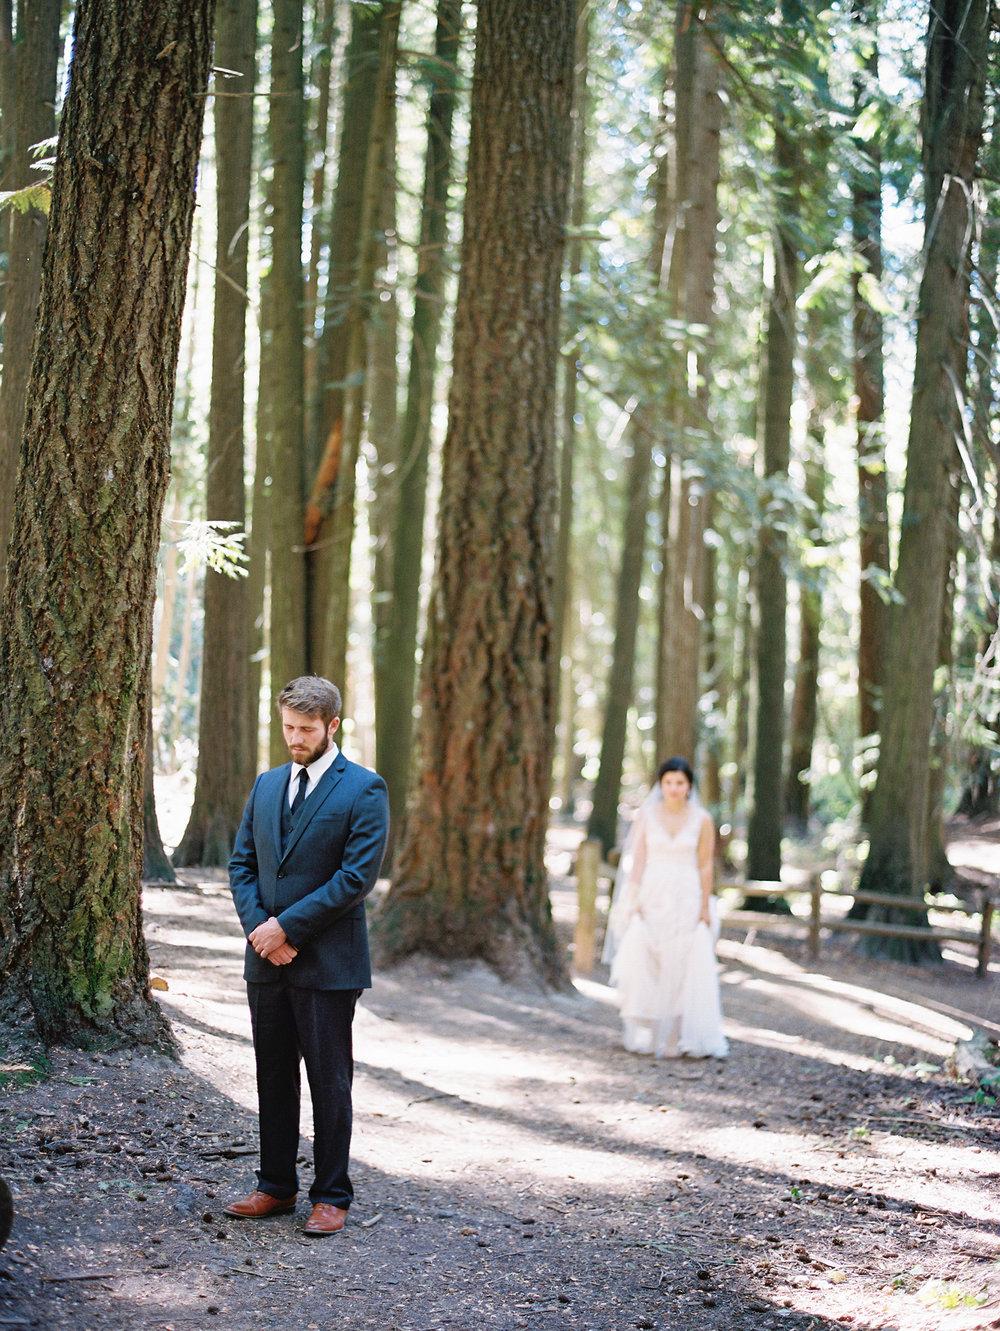 Idaho-Field-Forest-Wedding-Film-Photographer-Kristina-Adams-131 (1).jpg